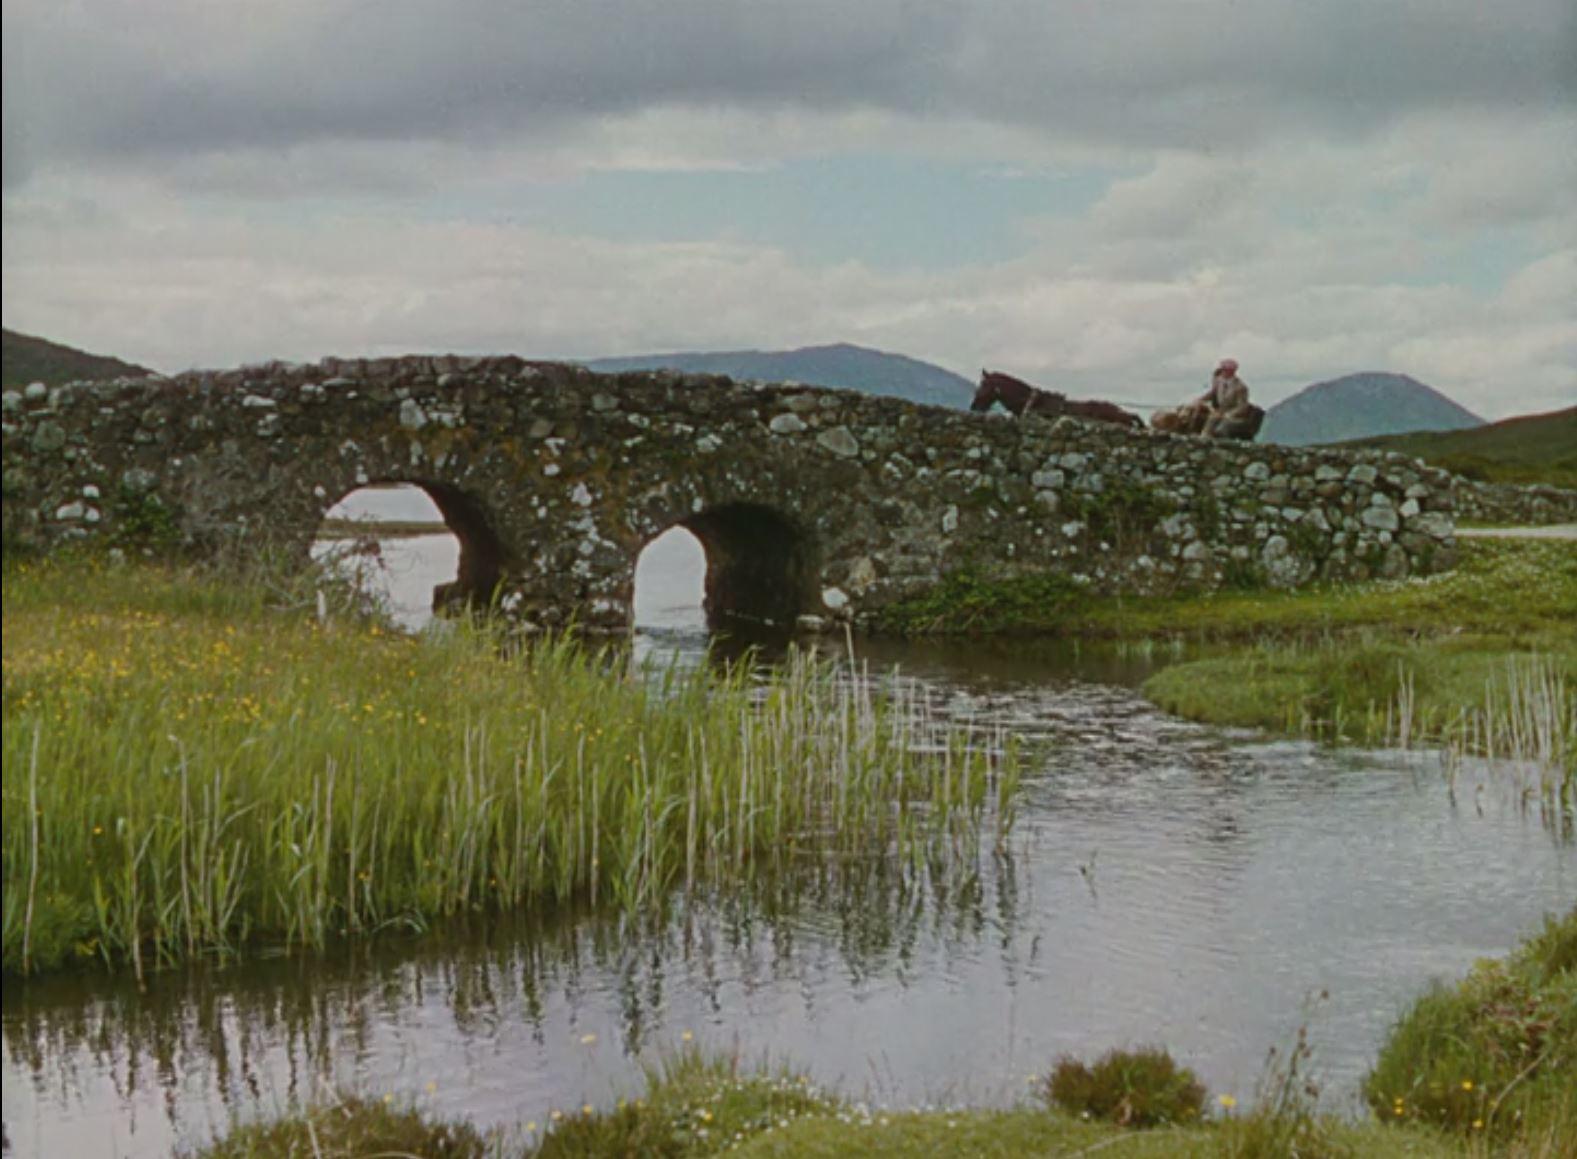 Sean Thornton (John Wayne) crosses the bridge as he enters the town in  The Quiet Man .